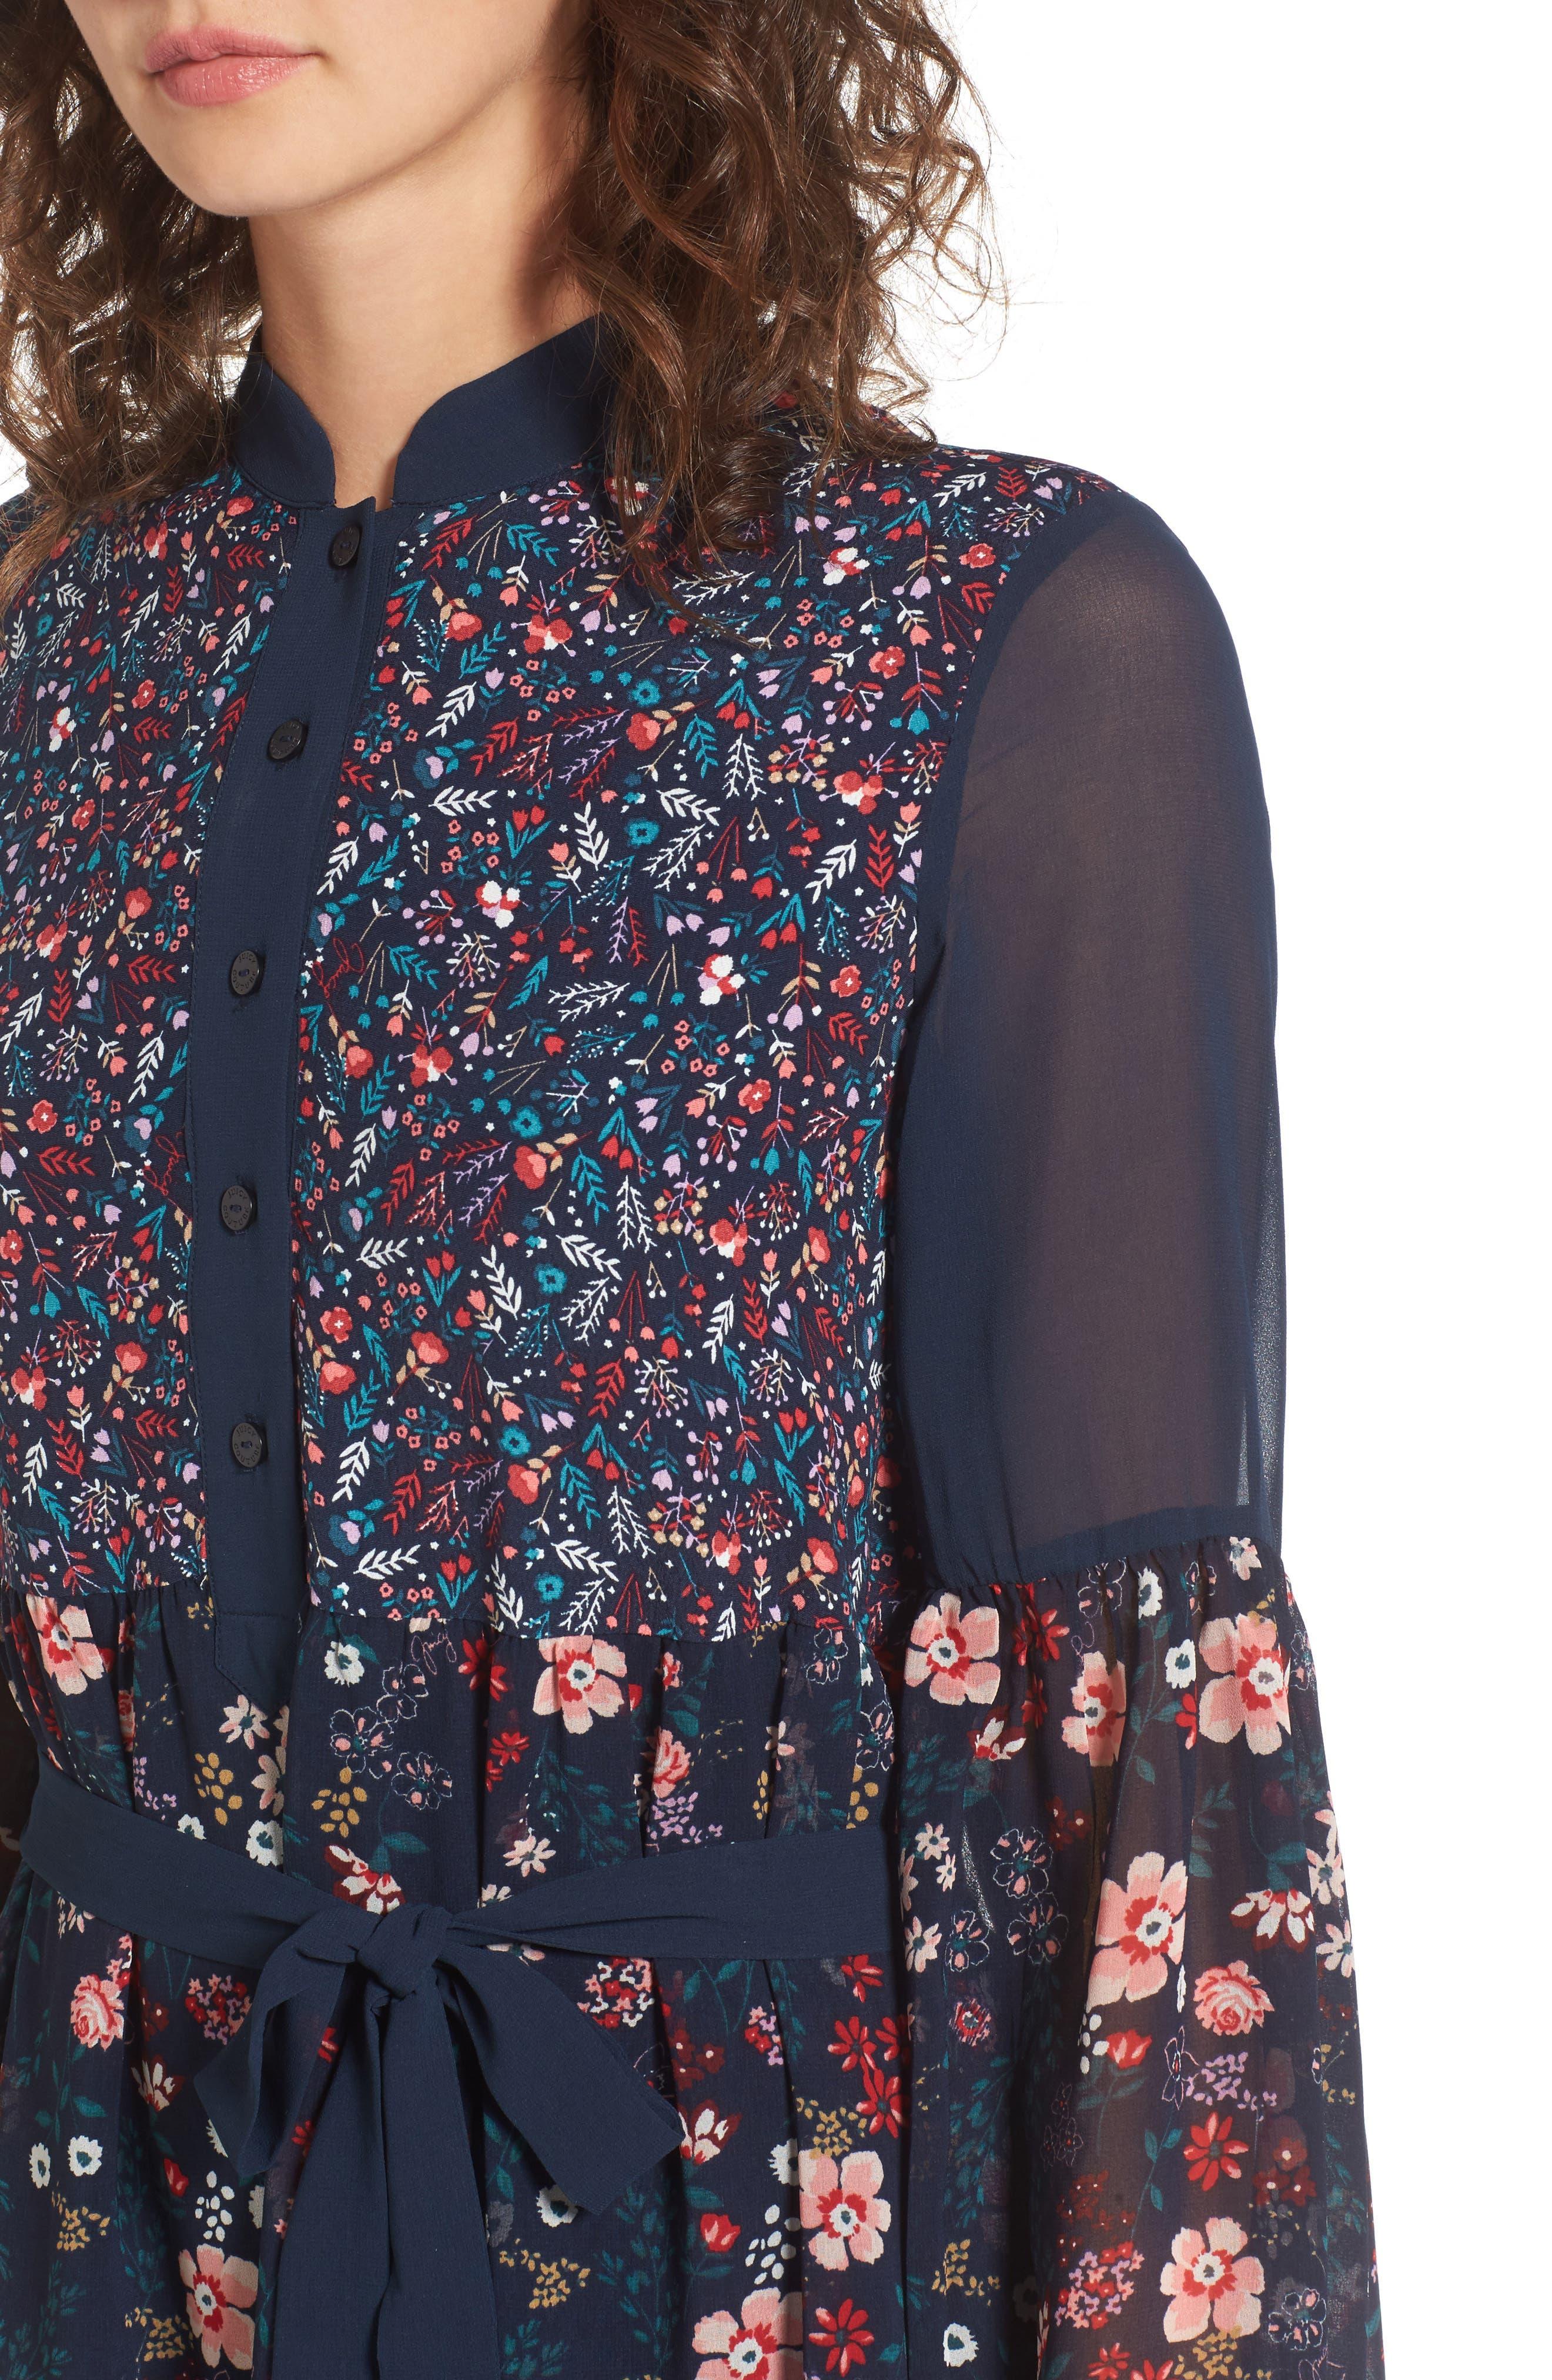 Caprice Floral Mix Shirtdress,                             Alternate thumbnail 4, color,                             Regal Caprice